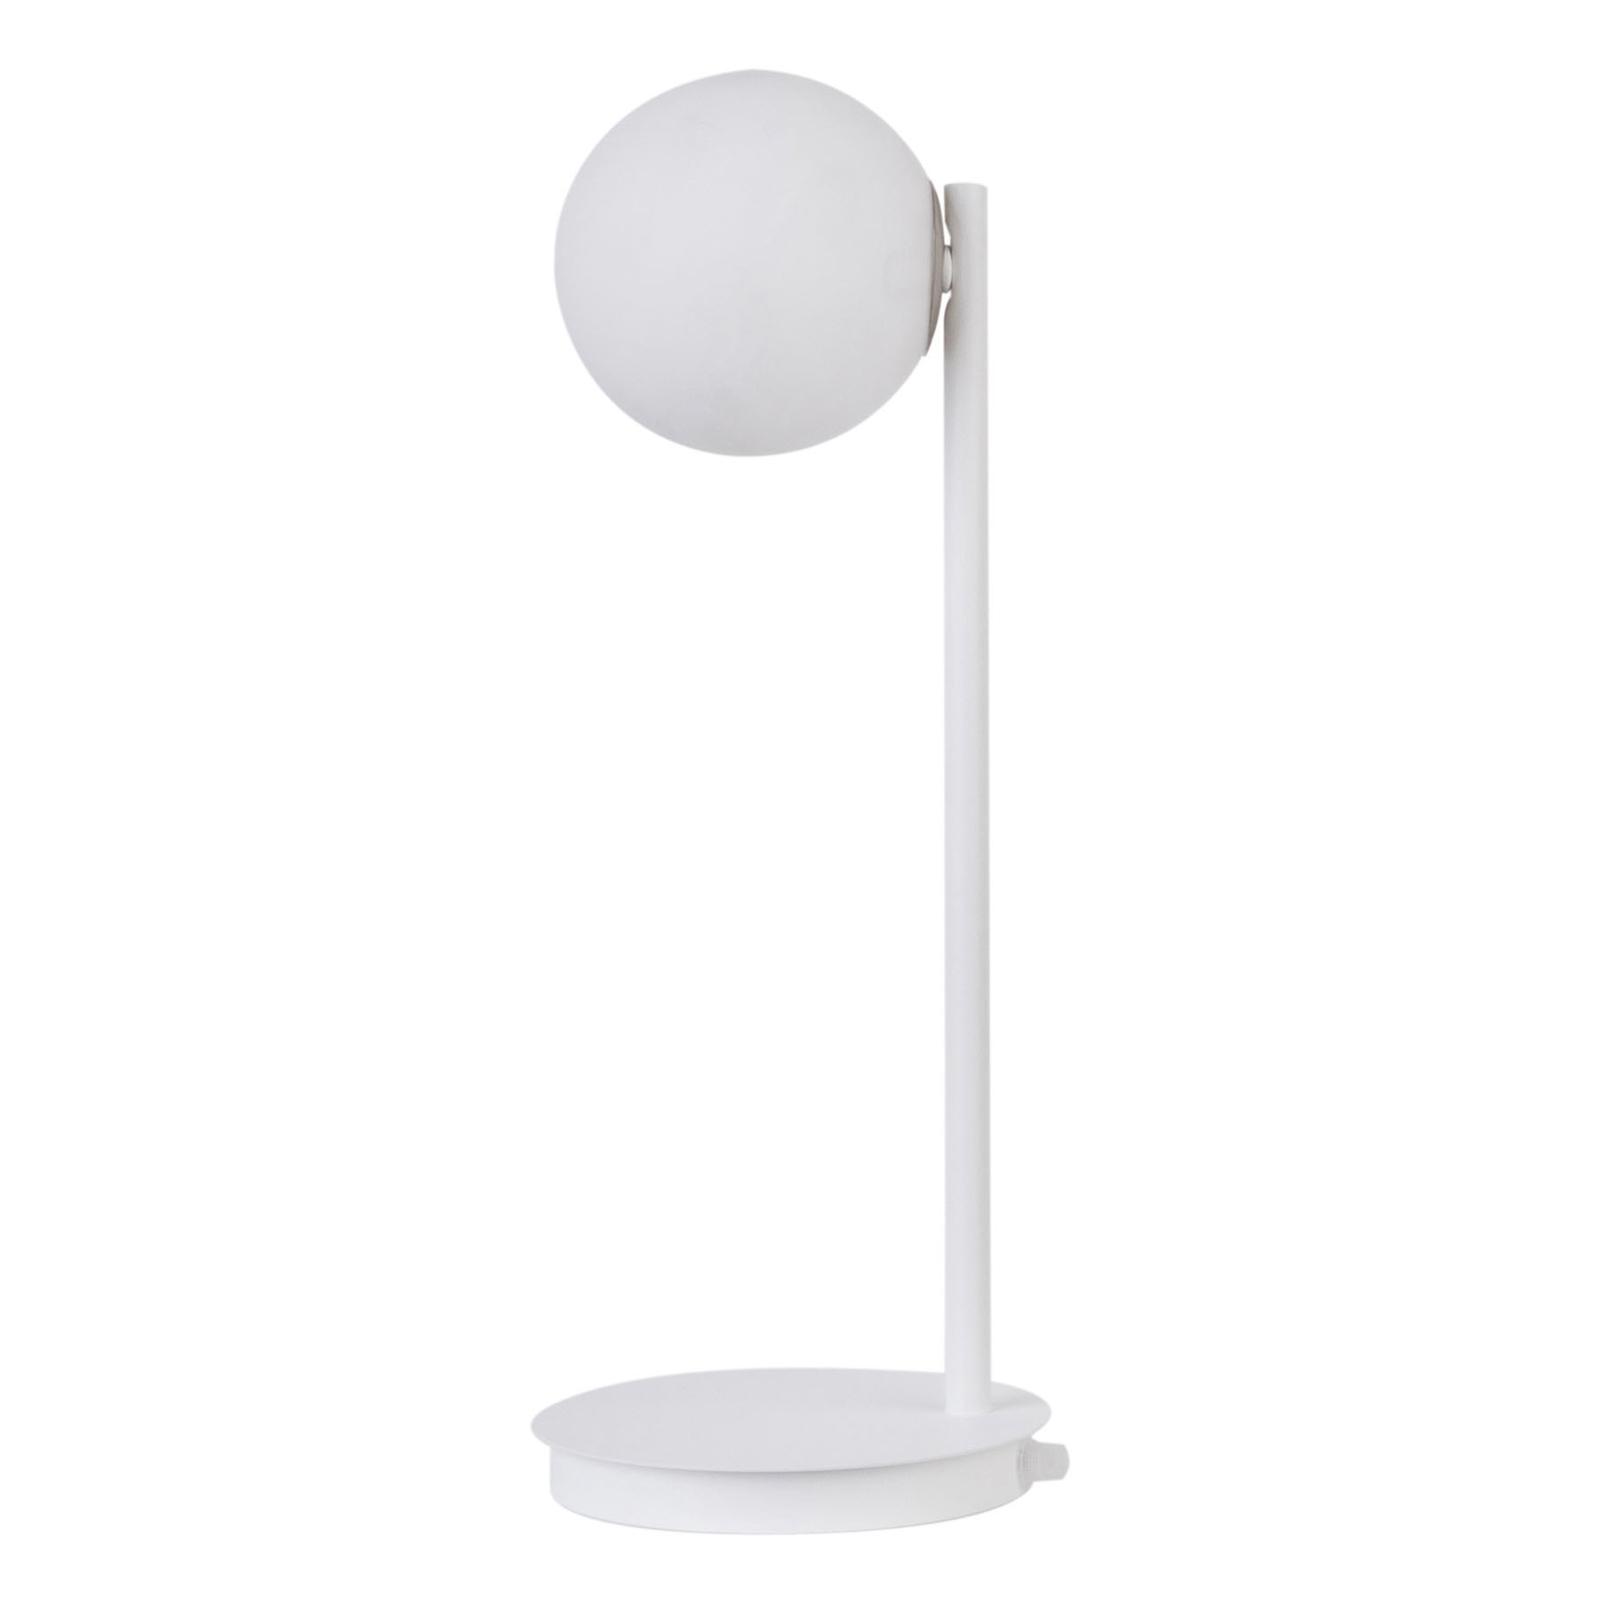 Gama bordlampe i hvid med glaskugle